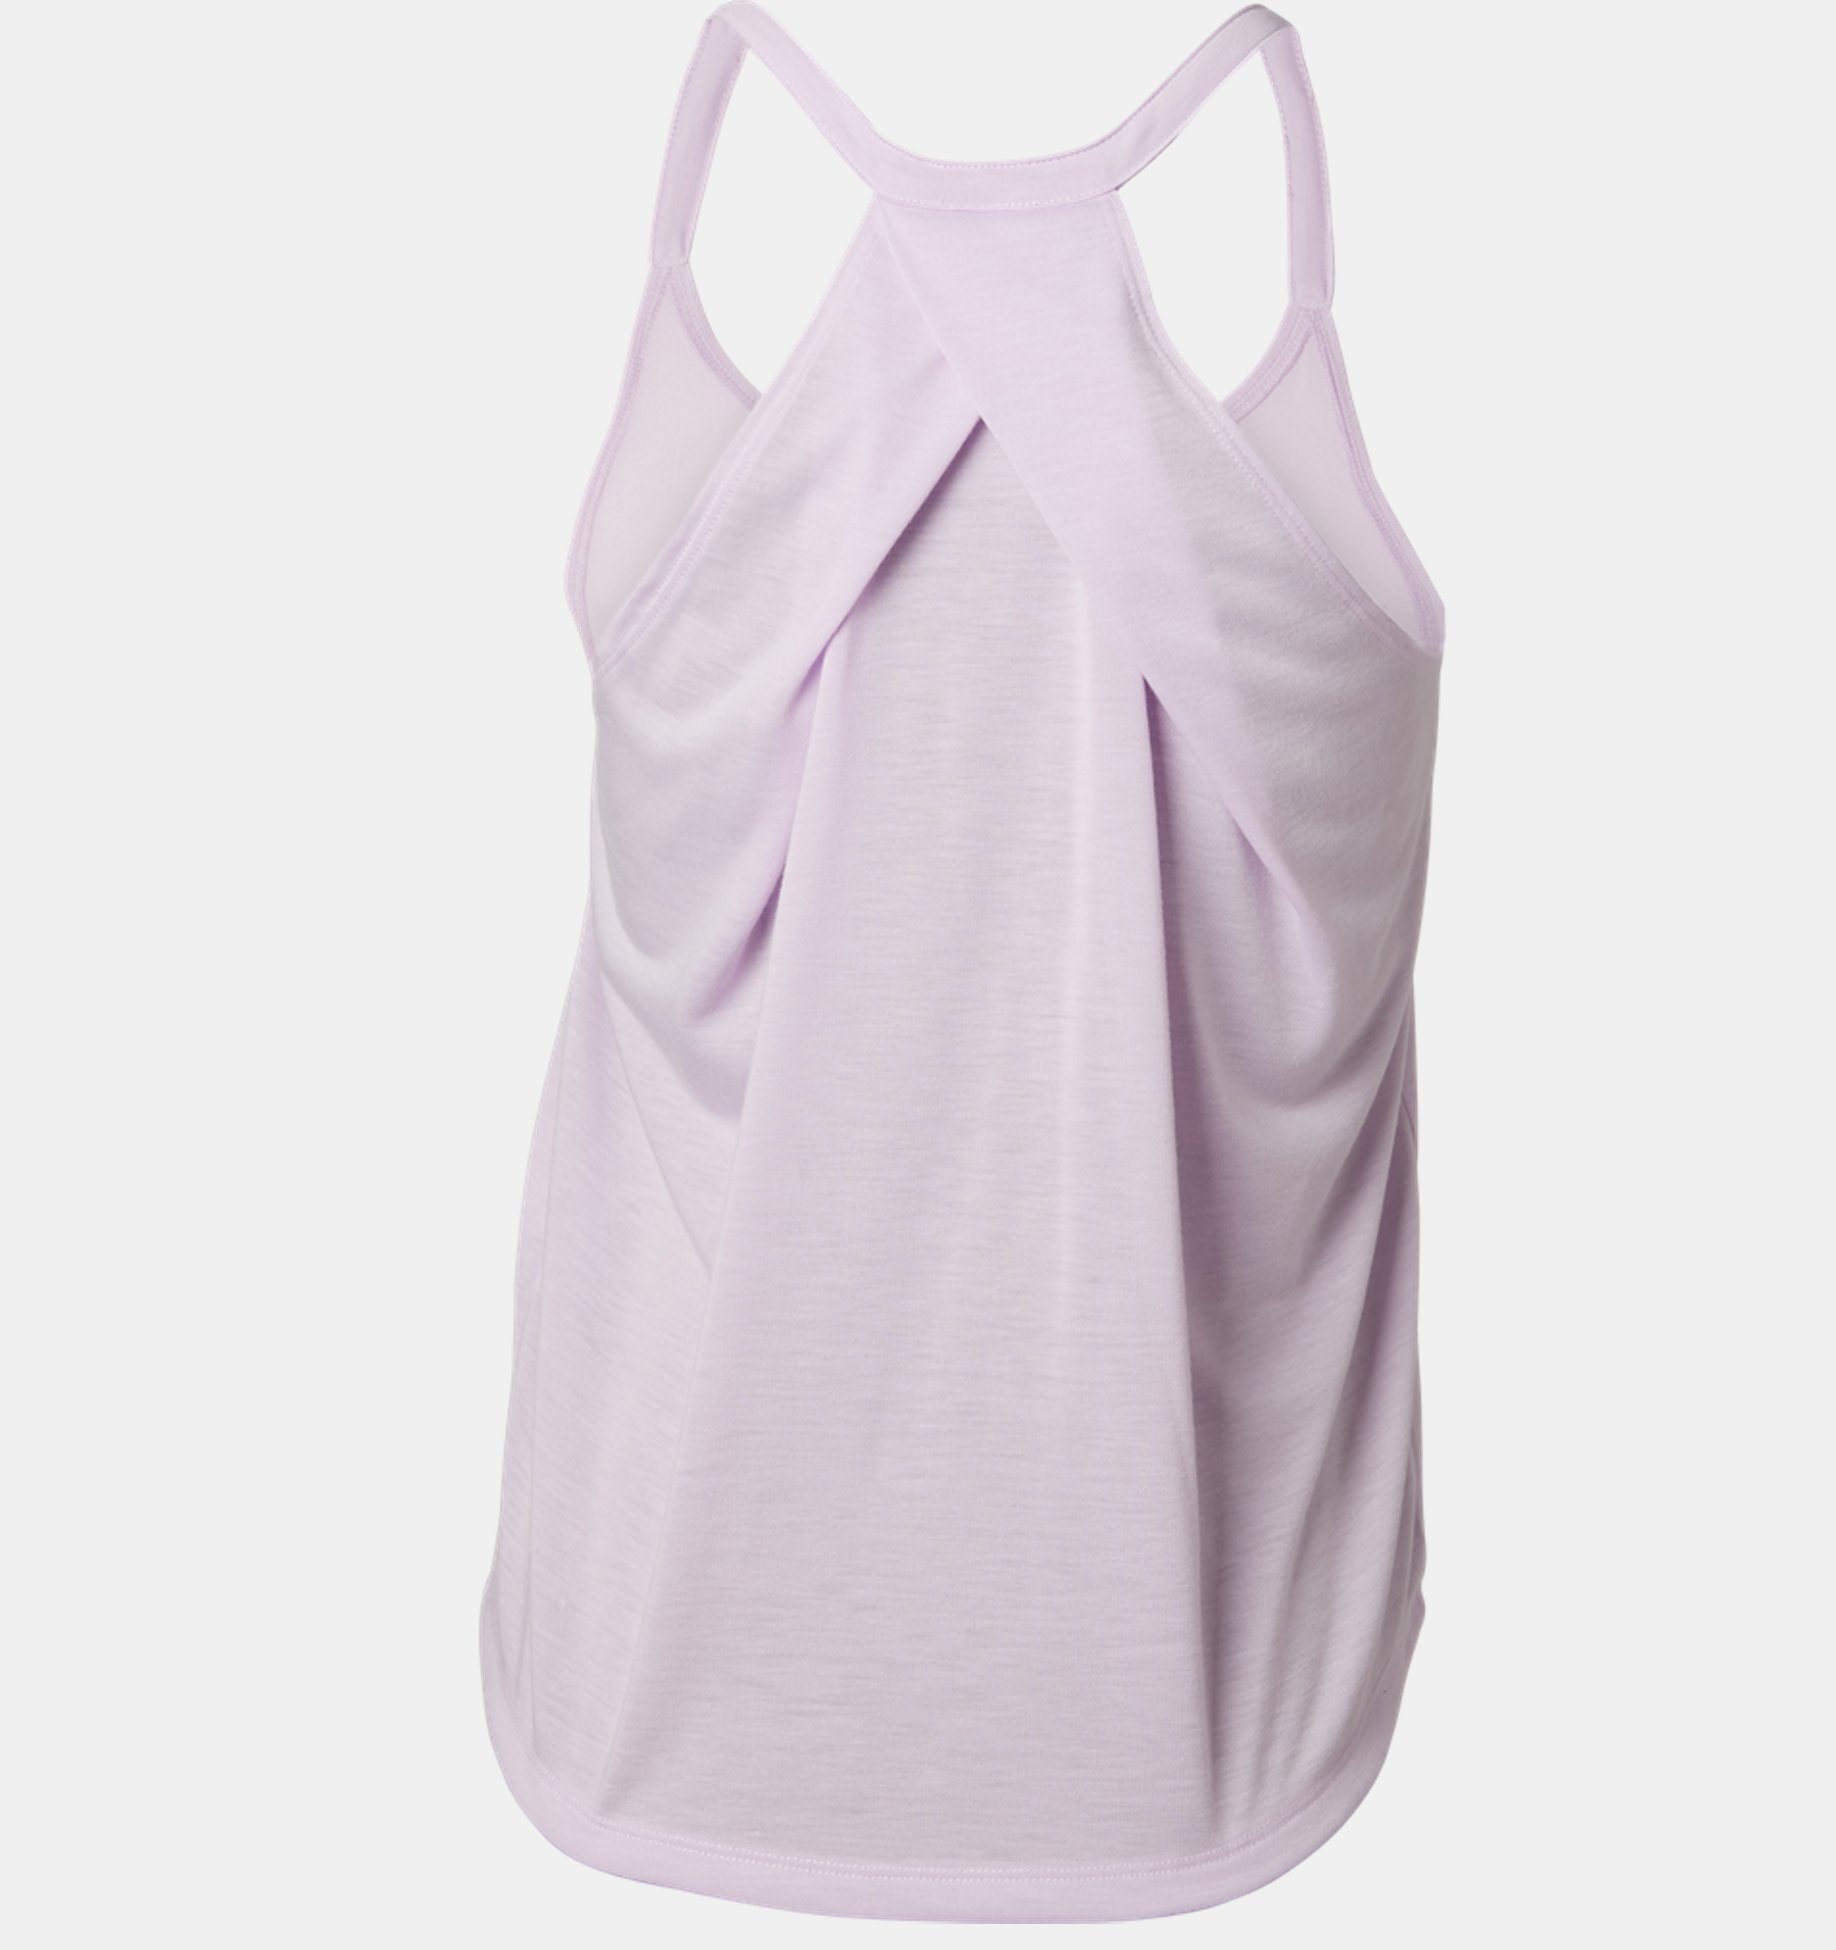 04dd14d9b1b1a ... Camiseta sin mangas UA Whisperlight Foldover para mujer